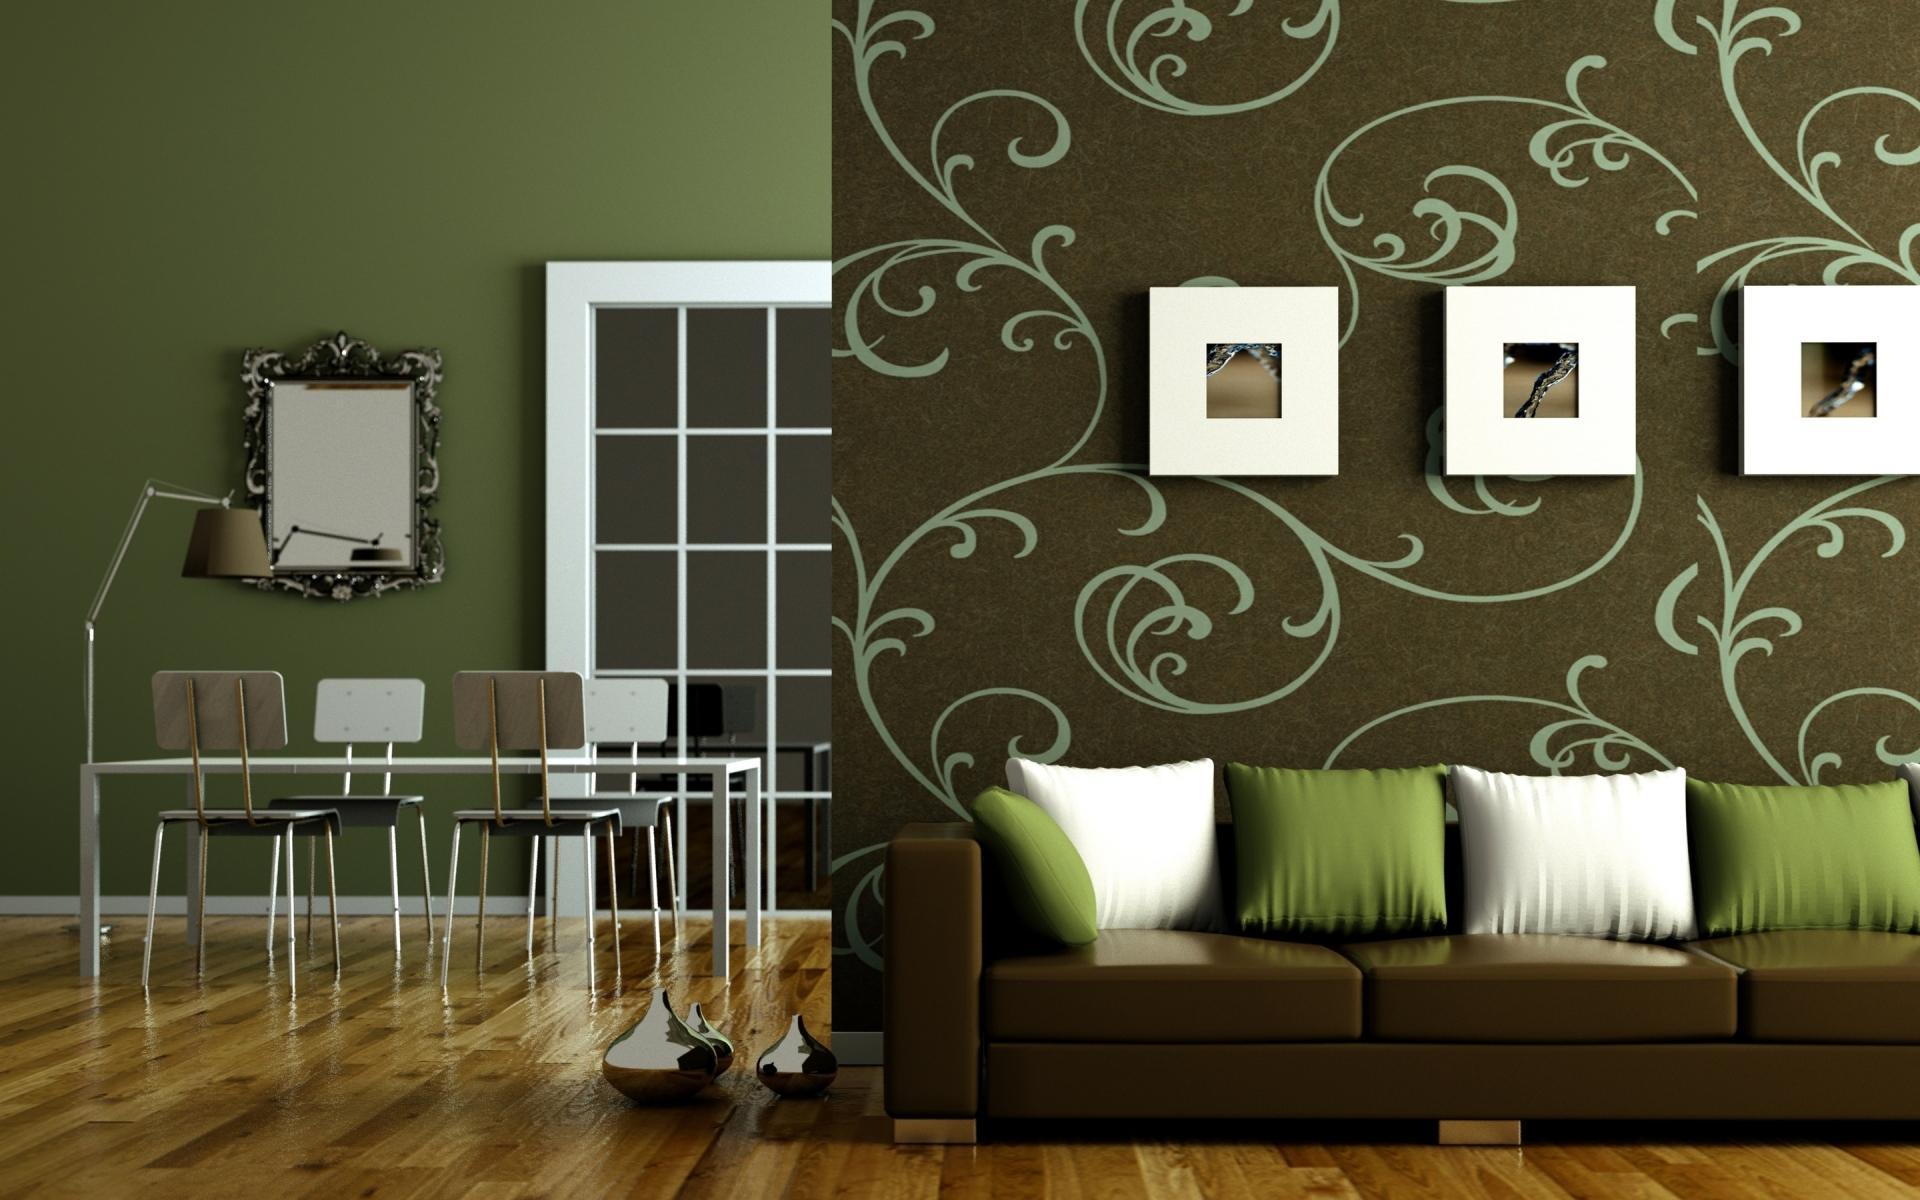 interior-wallpapers-28651-8480313.jpg